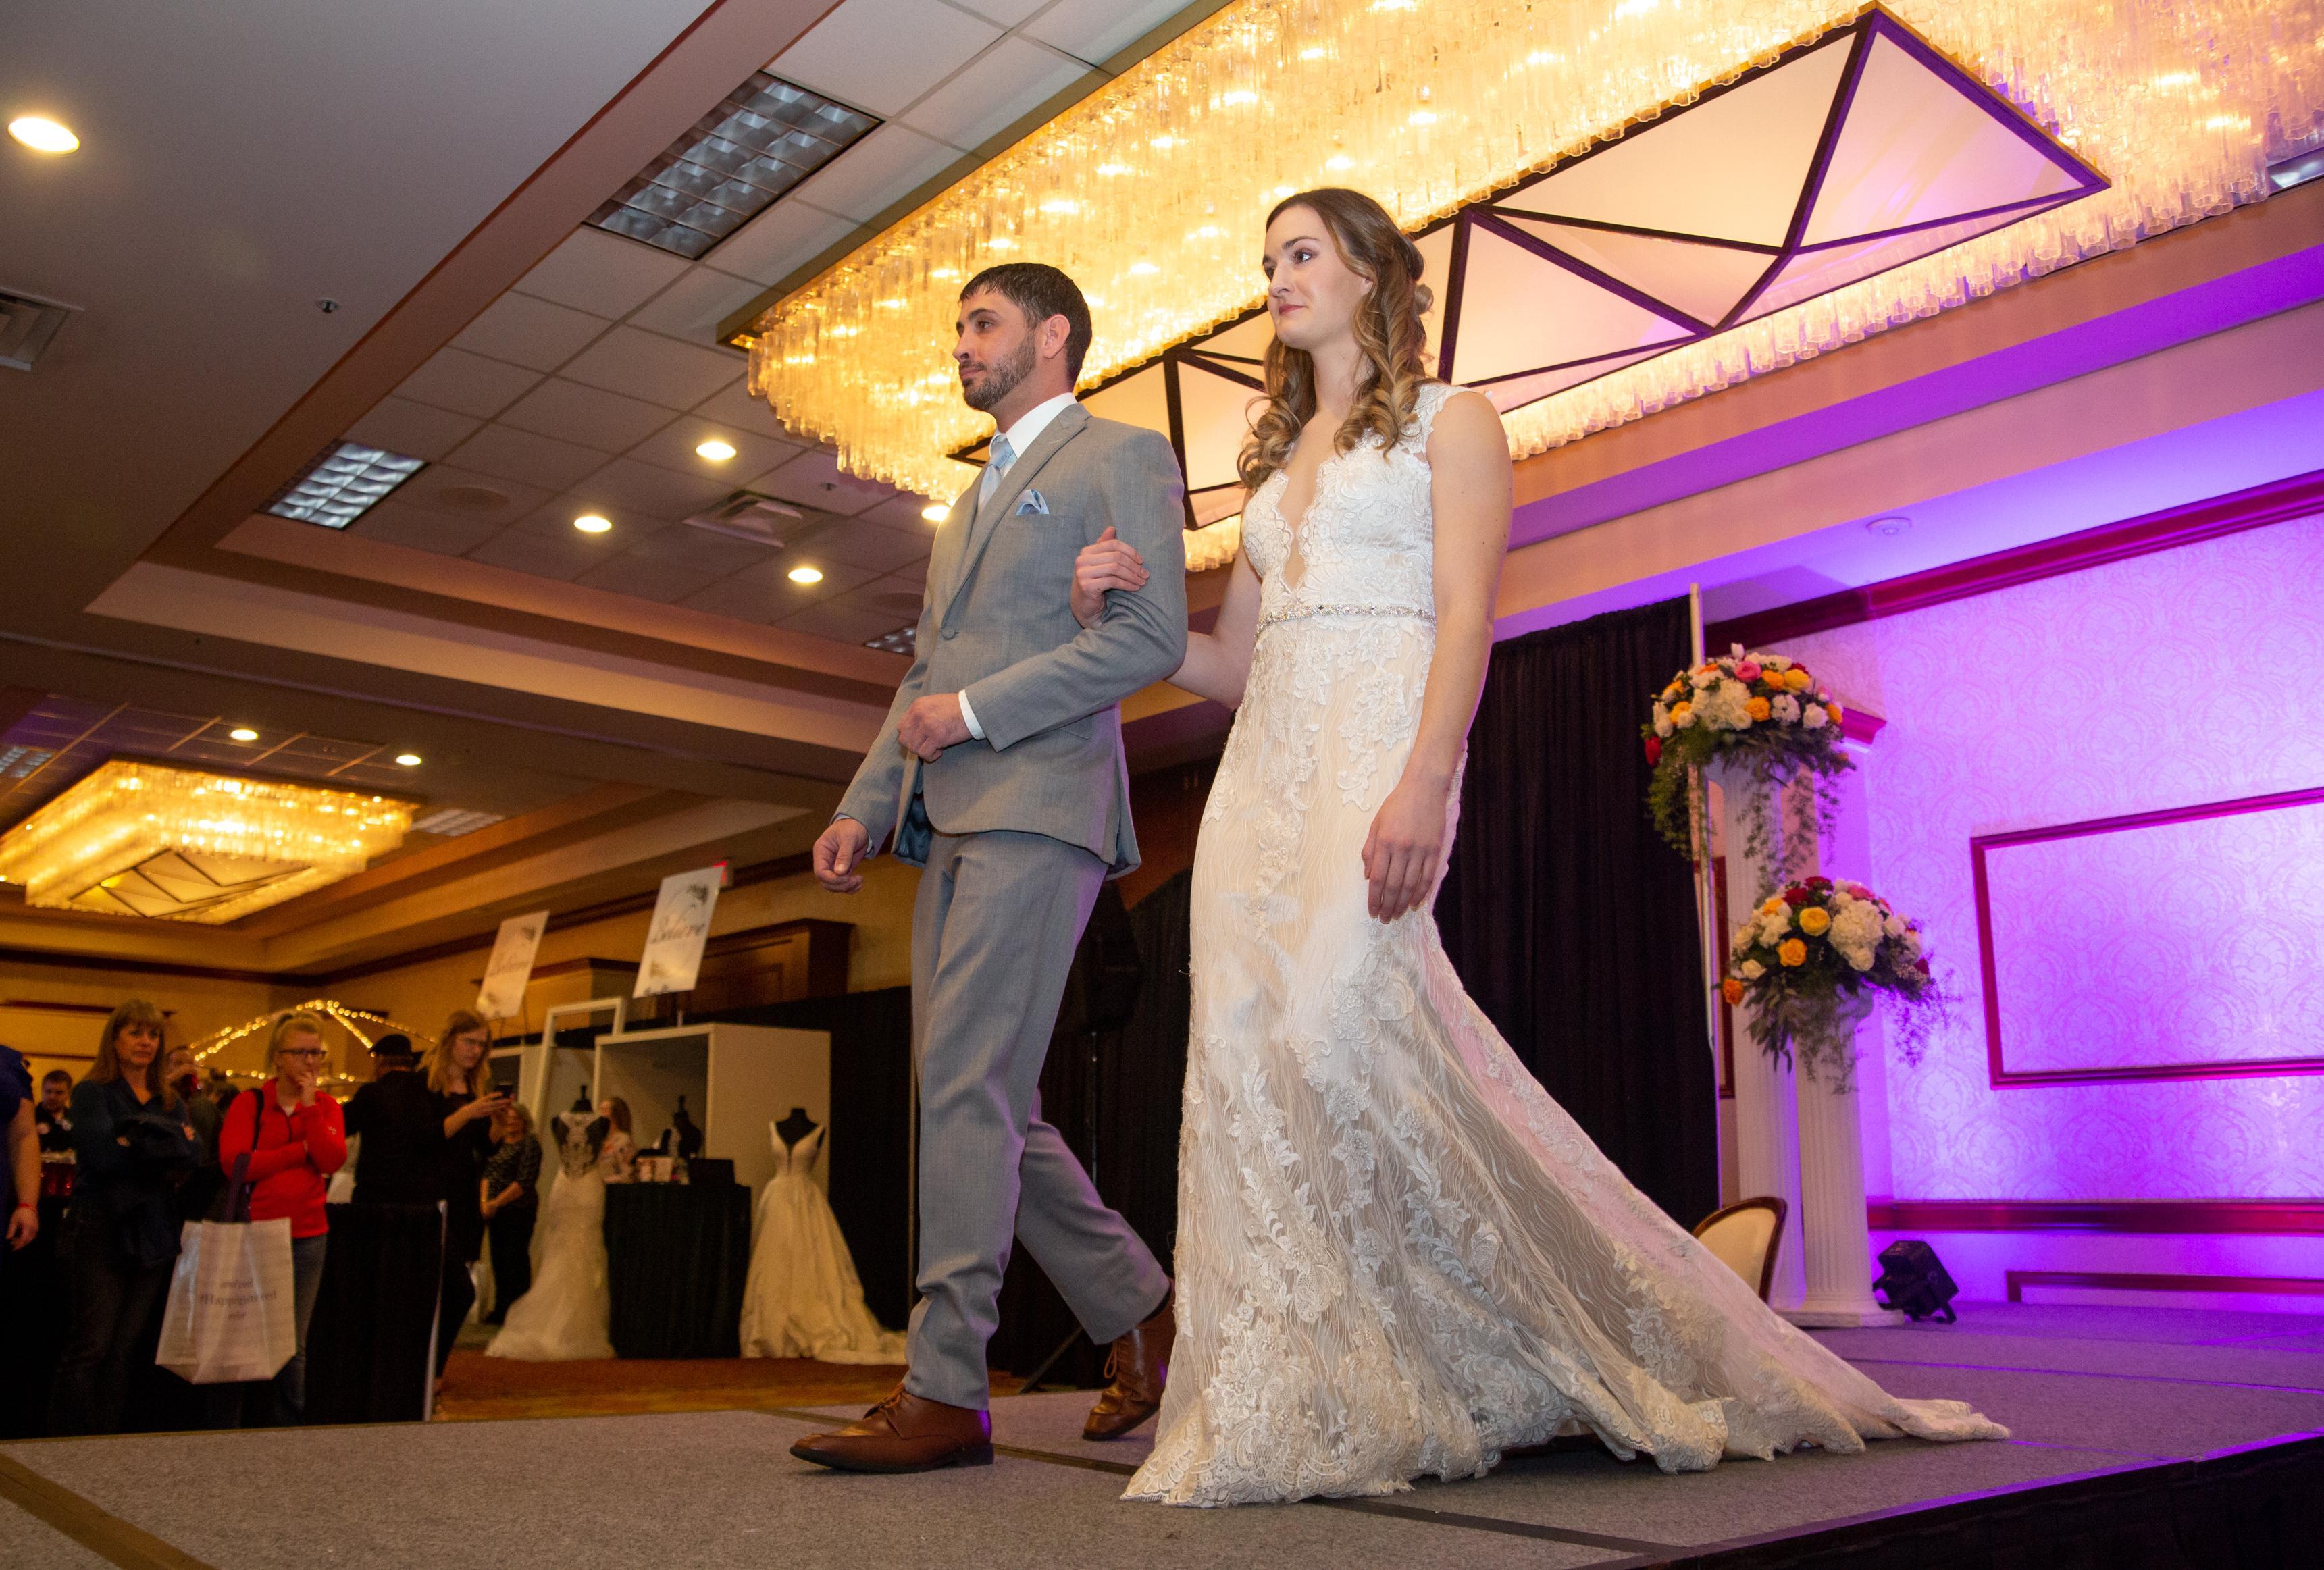 Spokane Wedding Expo Shows Off Latest Trends The Spokesman Review